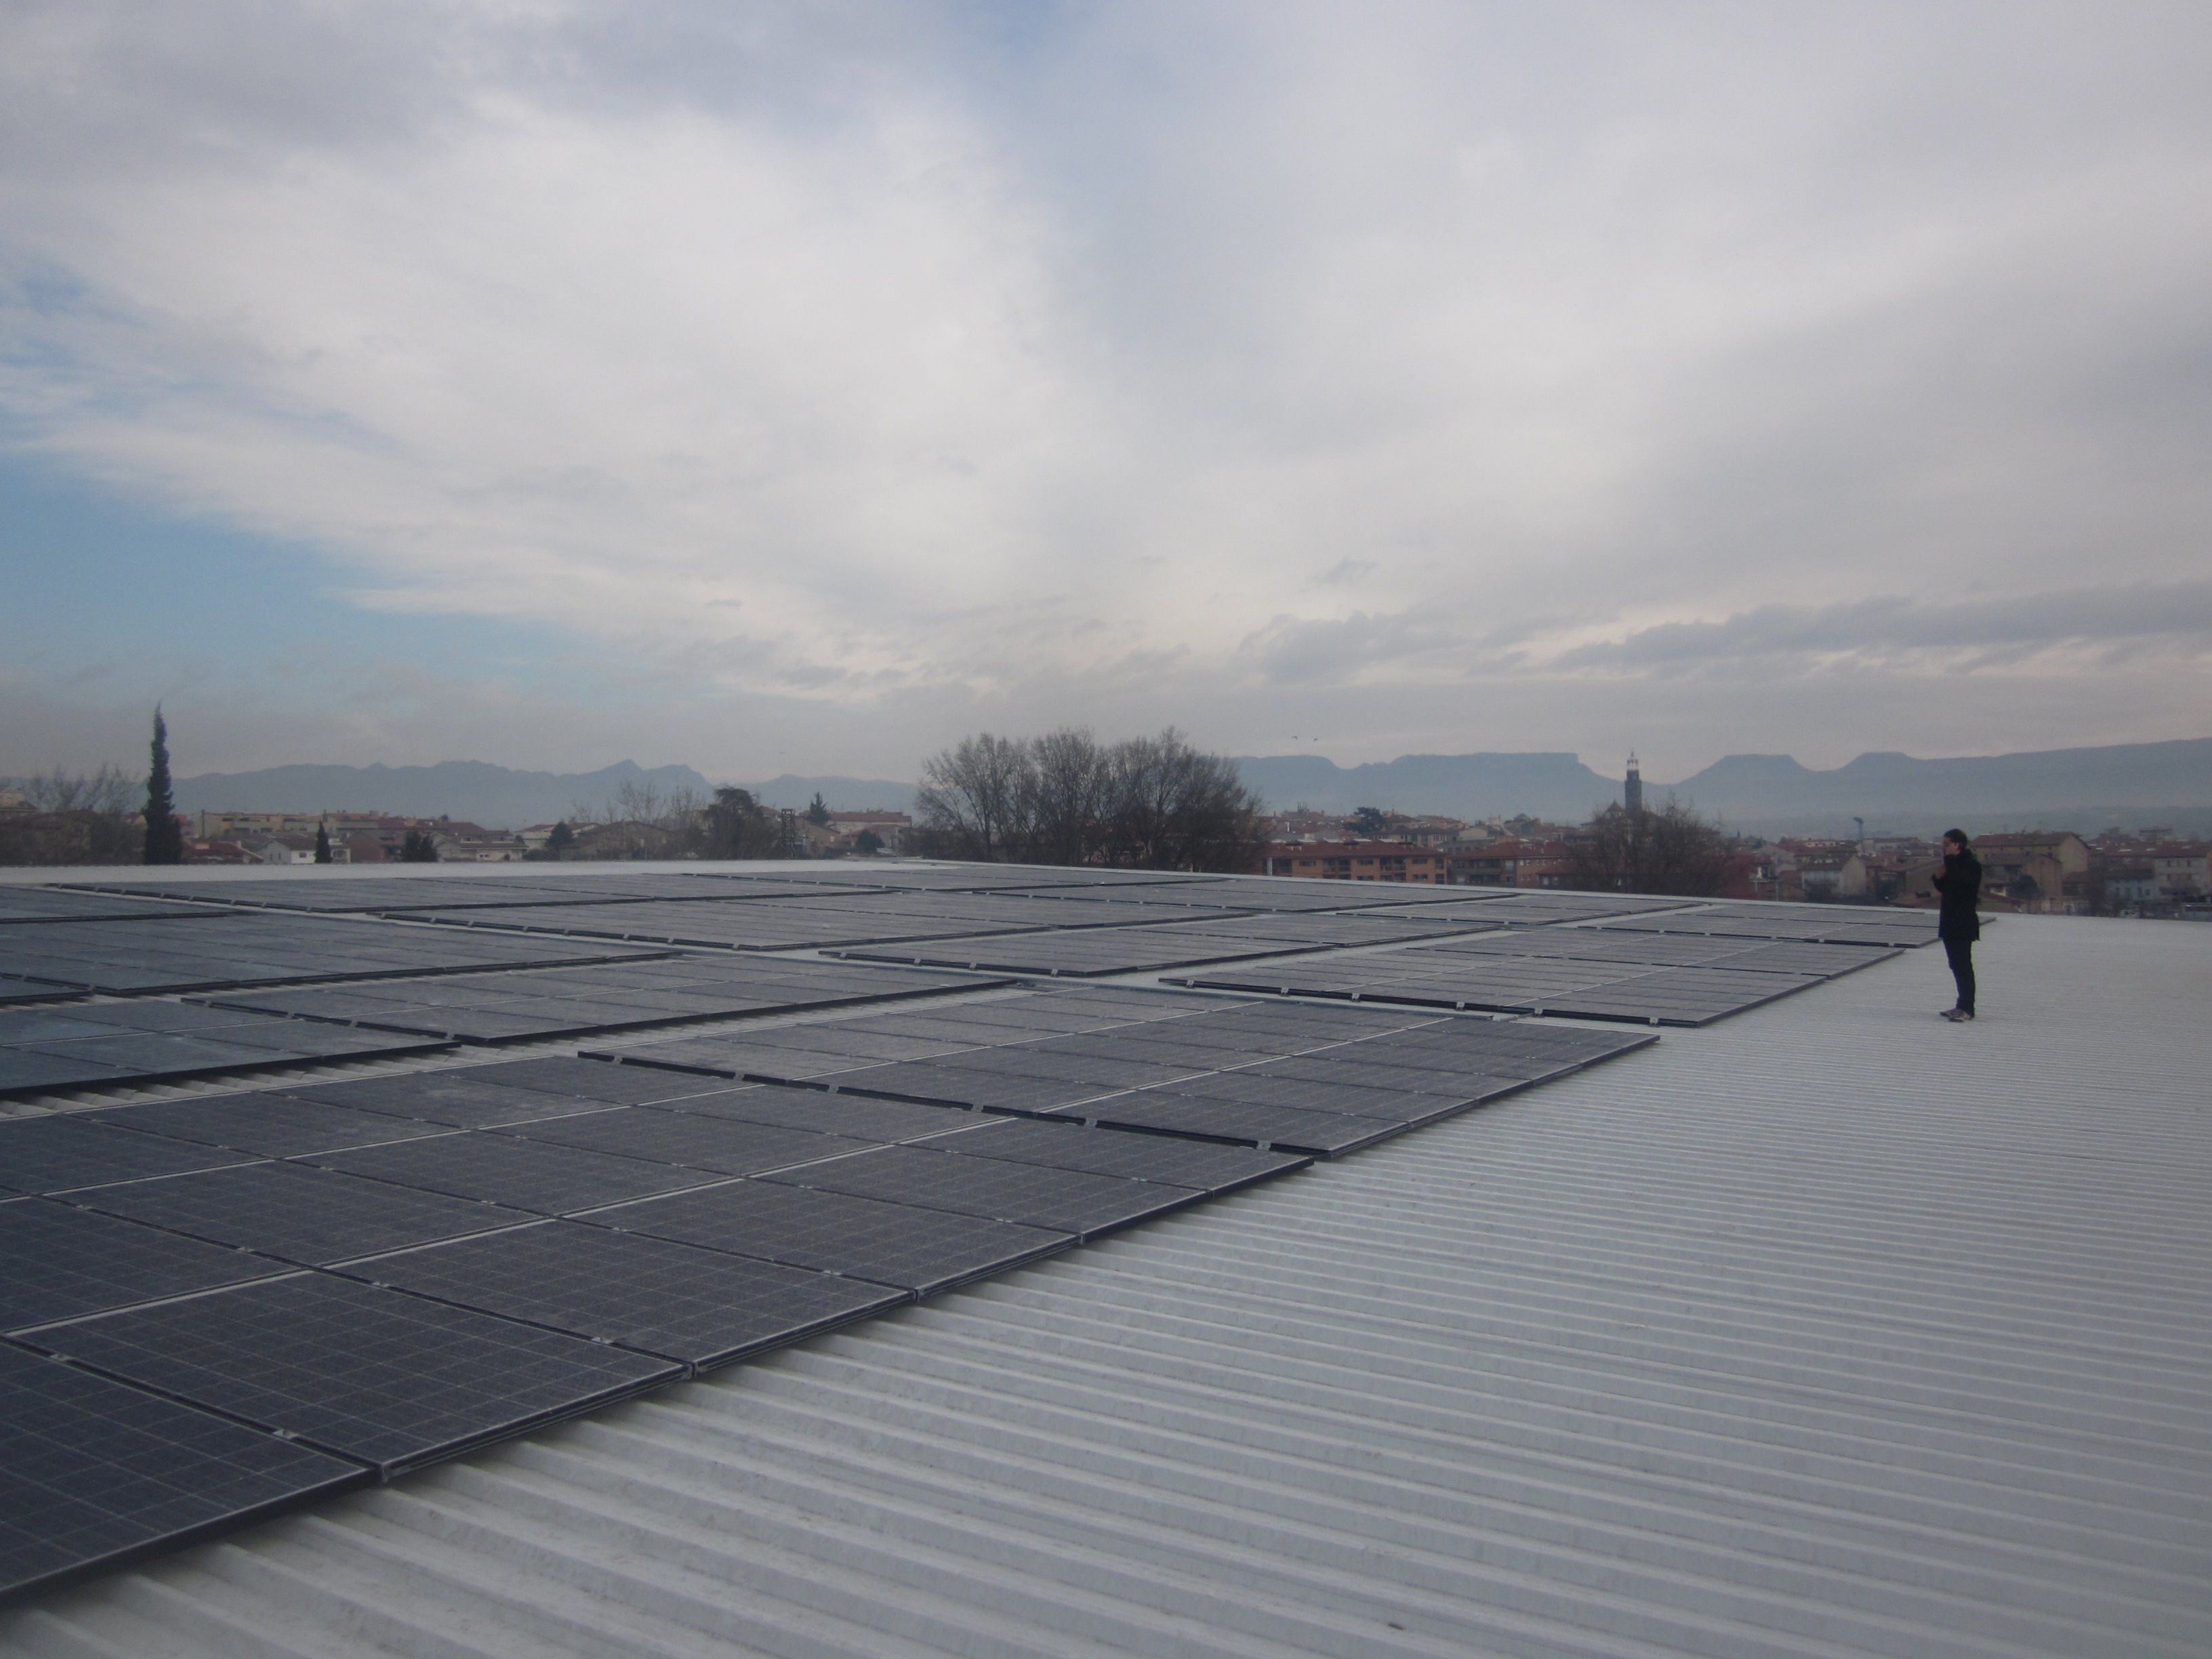 Cubierta fotovoltaica en Manlleu